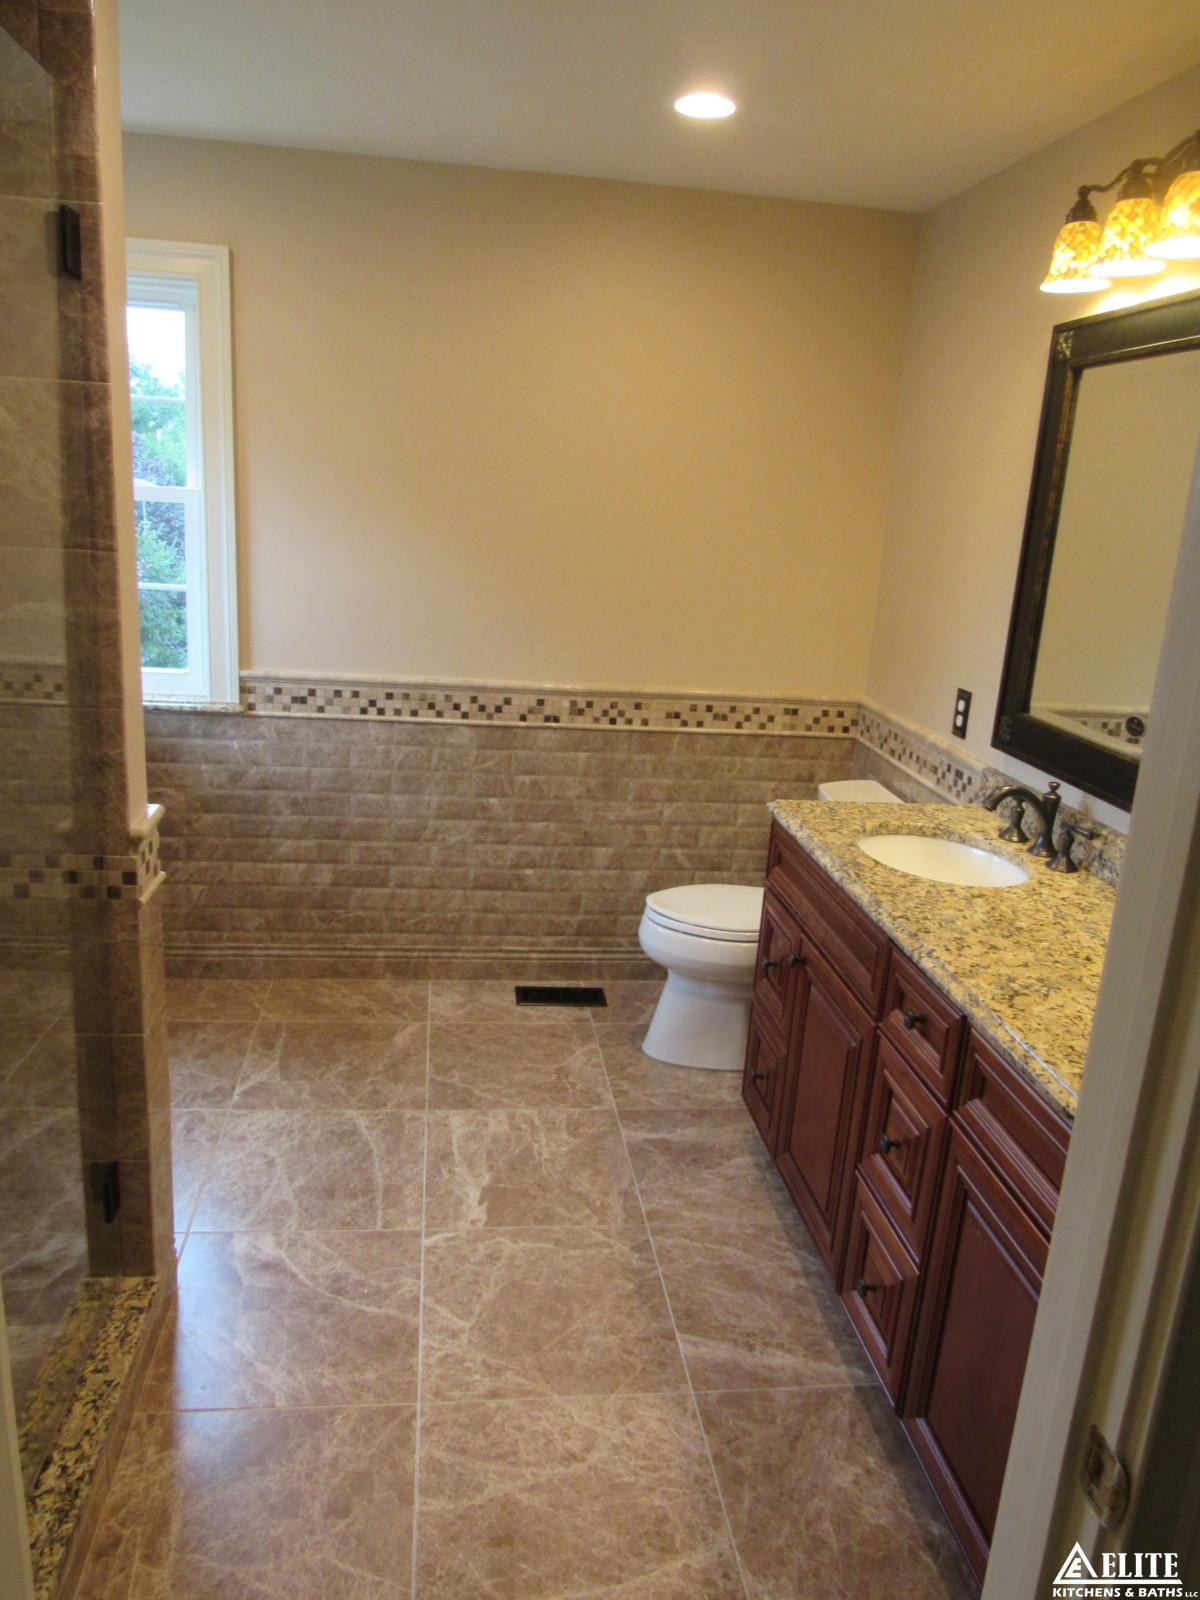 Bathrooms 107